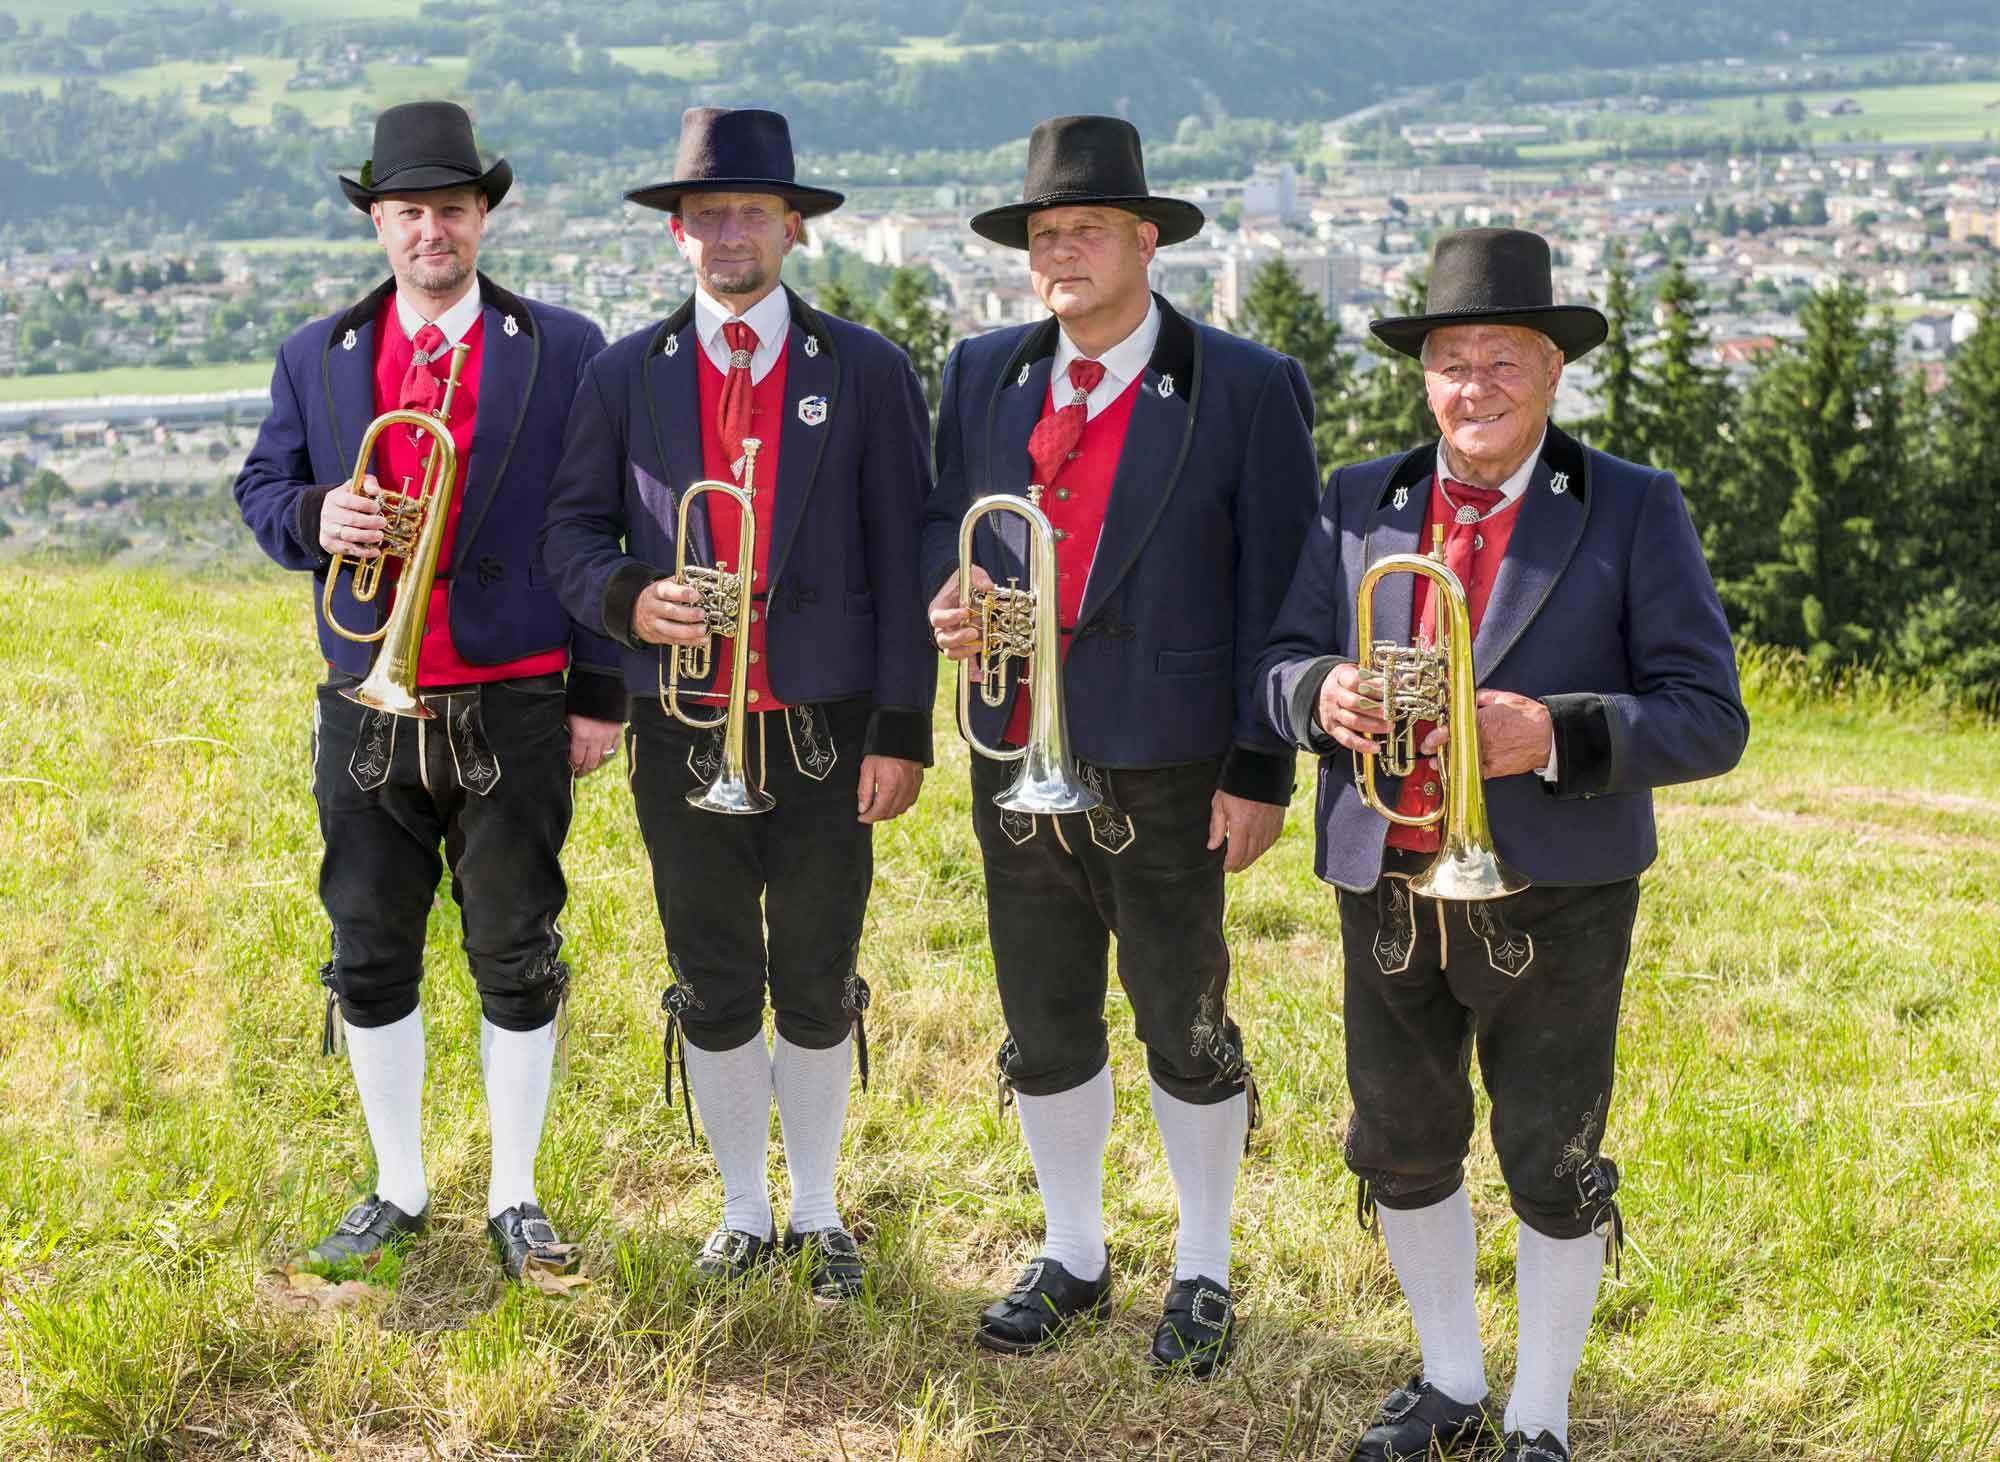 Flügelhorn: Andreas Kerschbaumer, Manfred Rieder, Günther Maier, Adi Erb